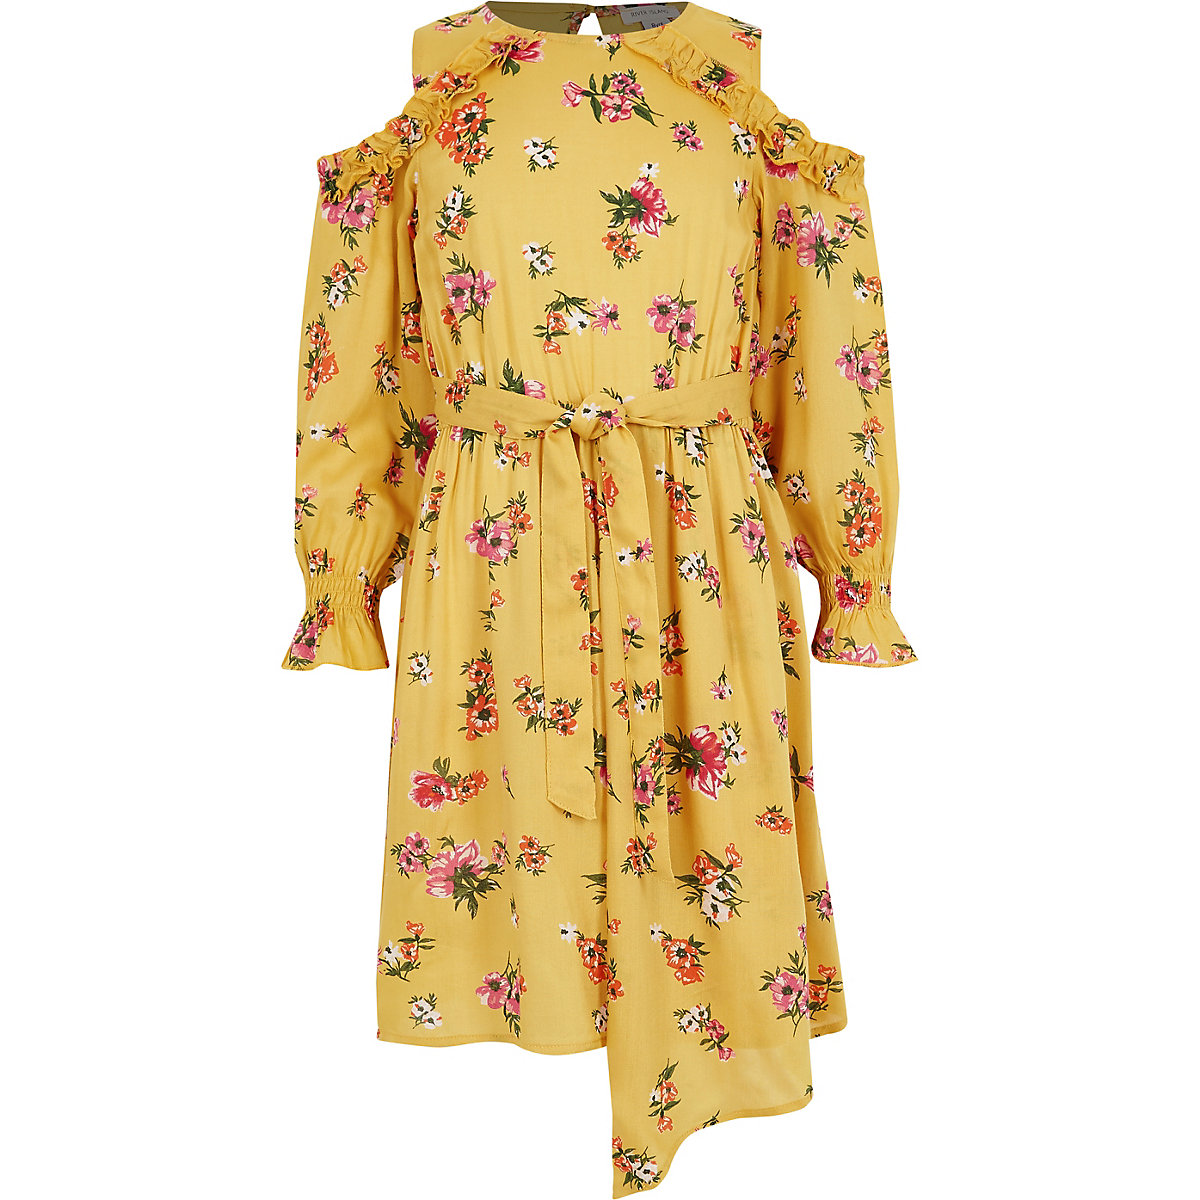 Girls yellow floral print cold shoulder dress